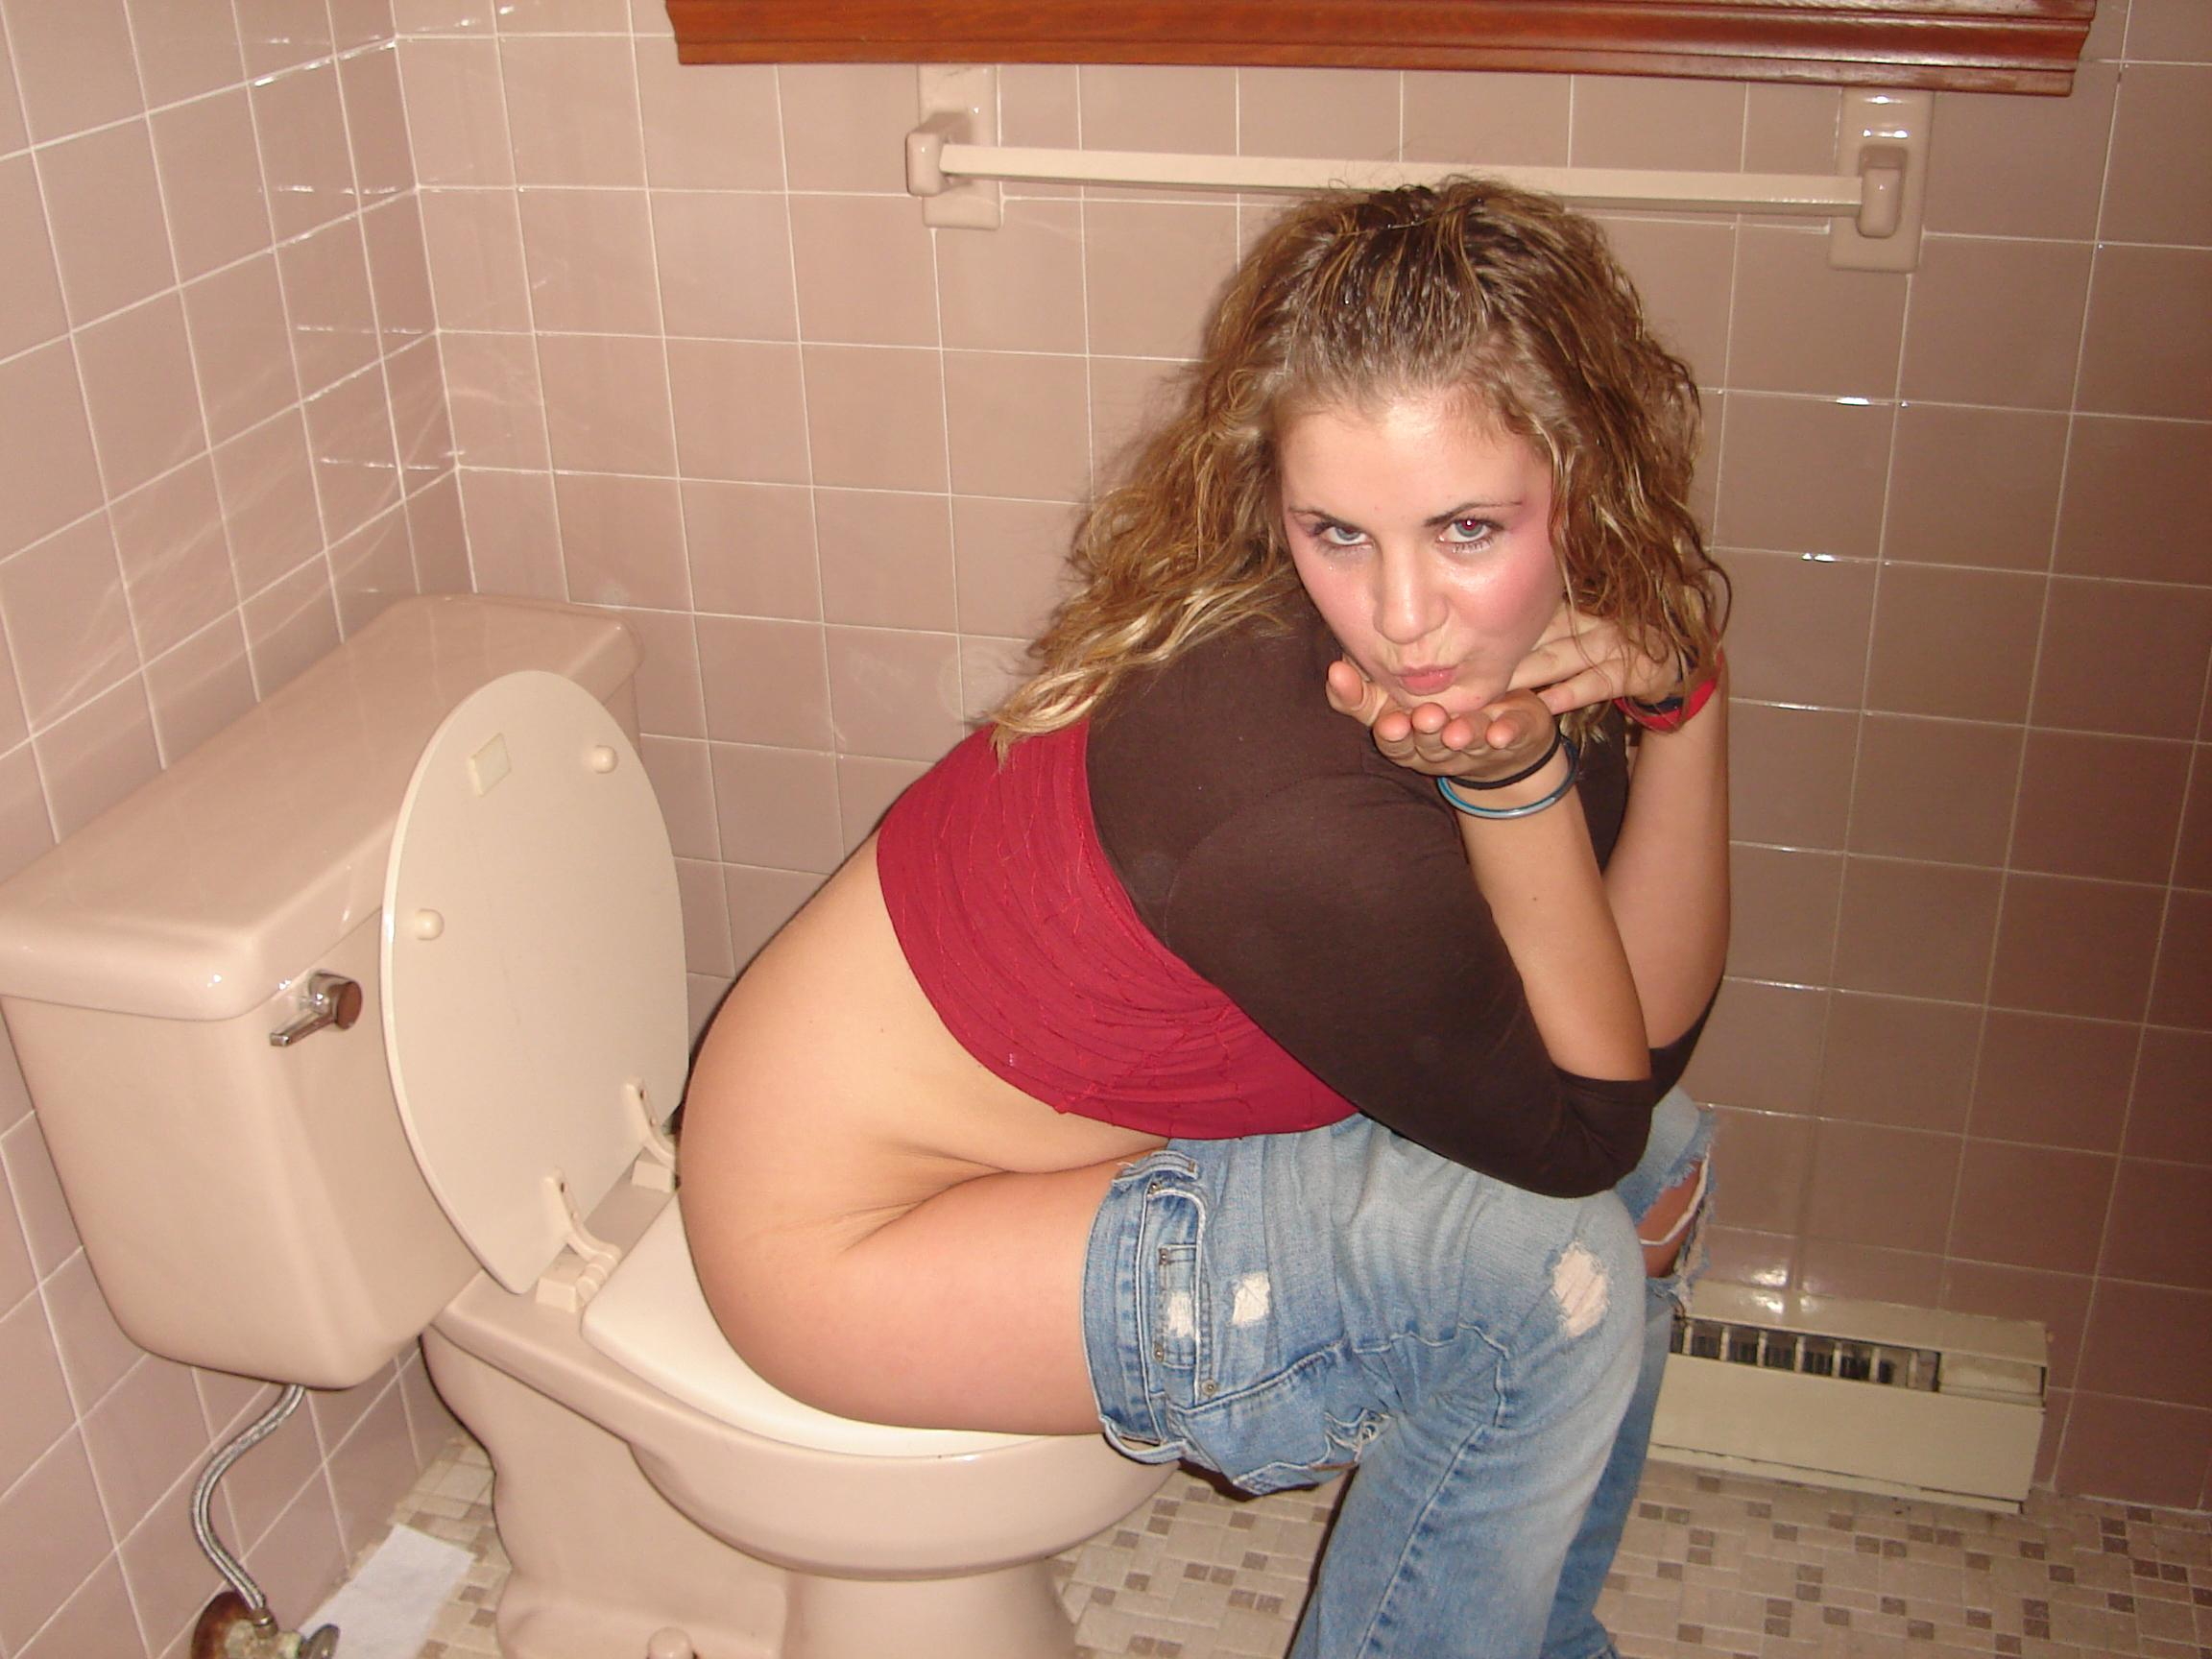 Panties girls pissing toilet